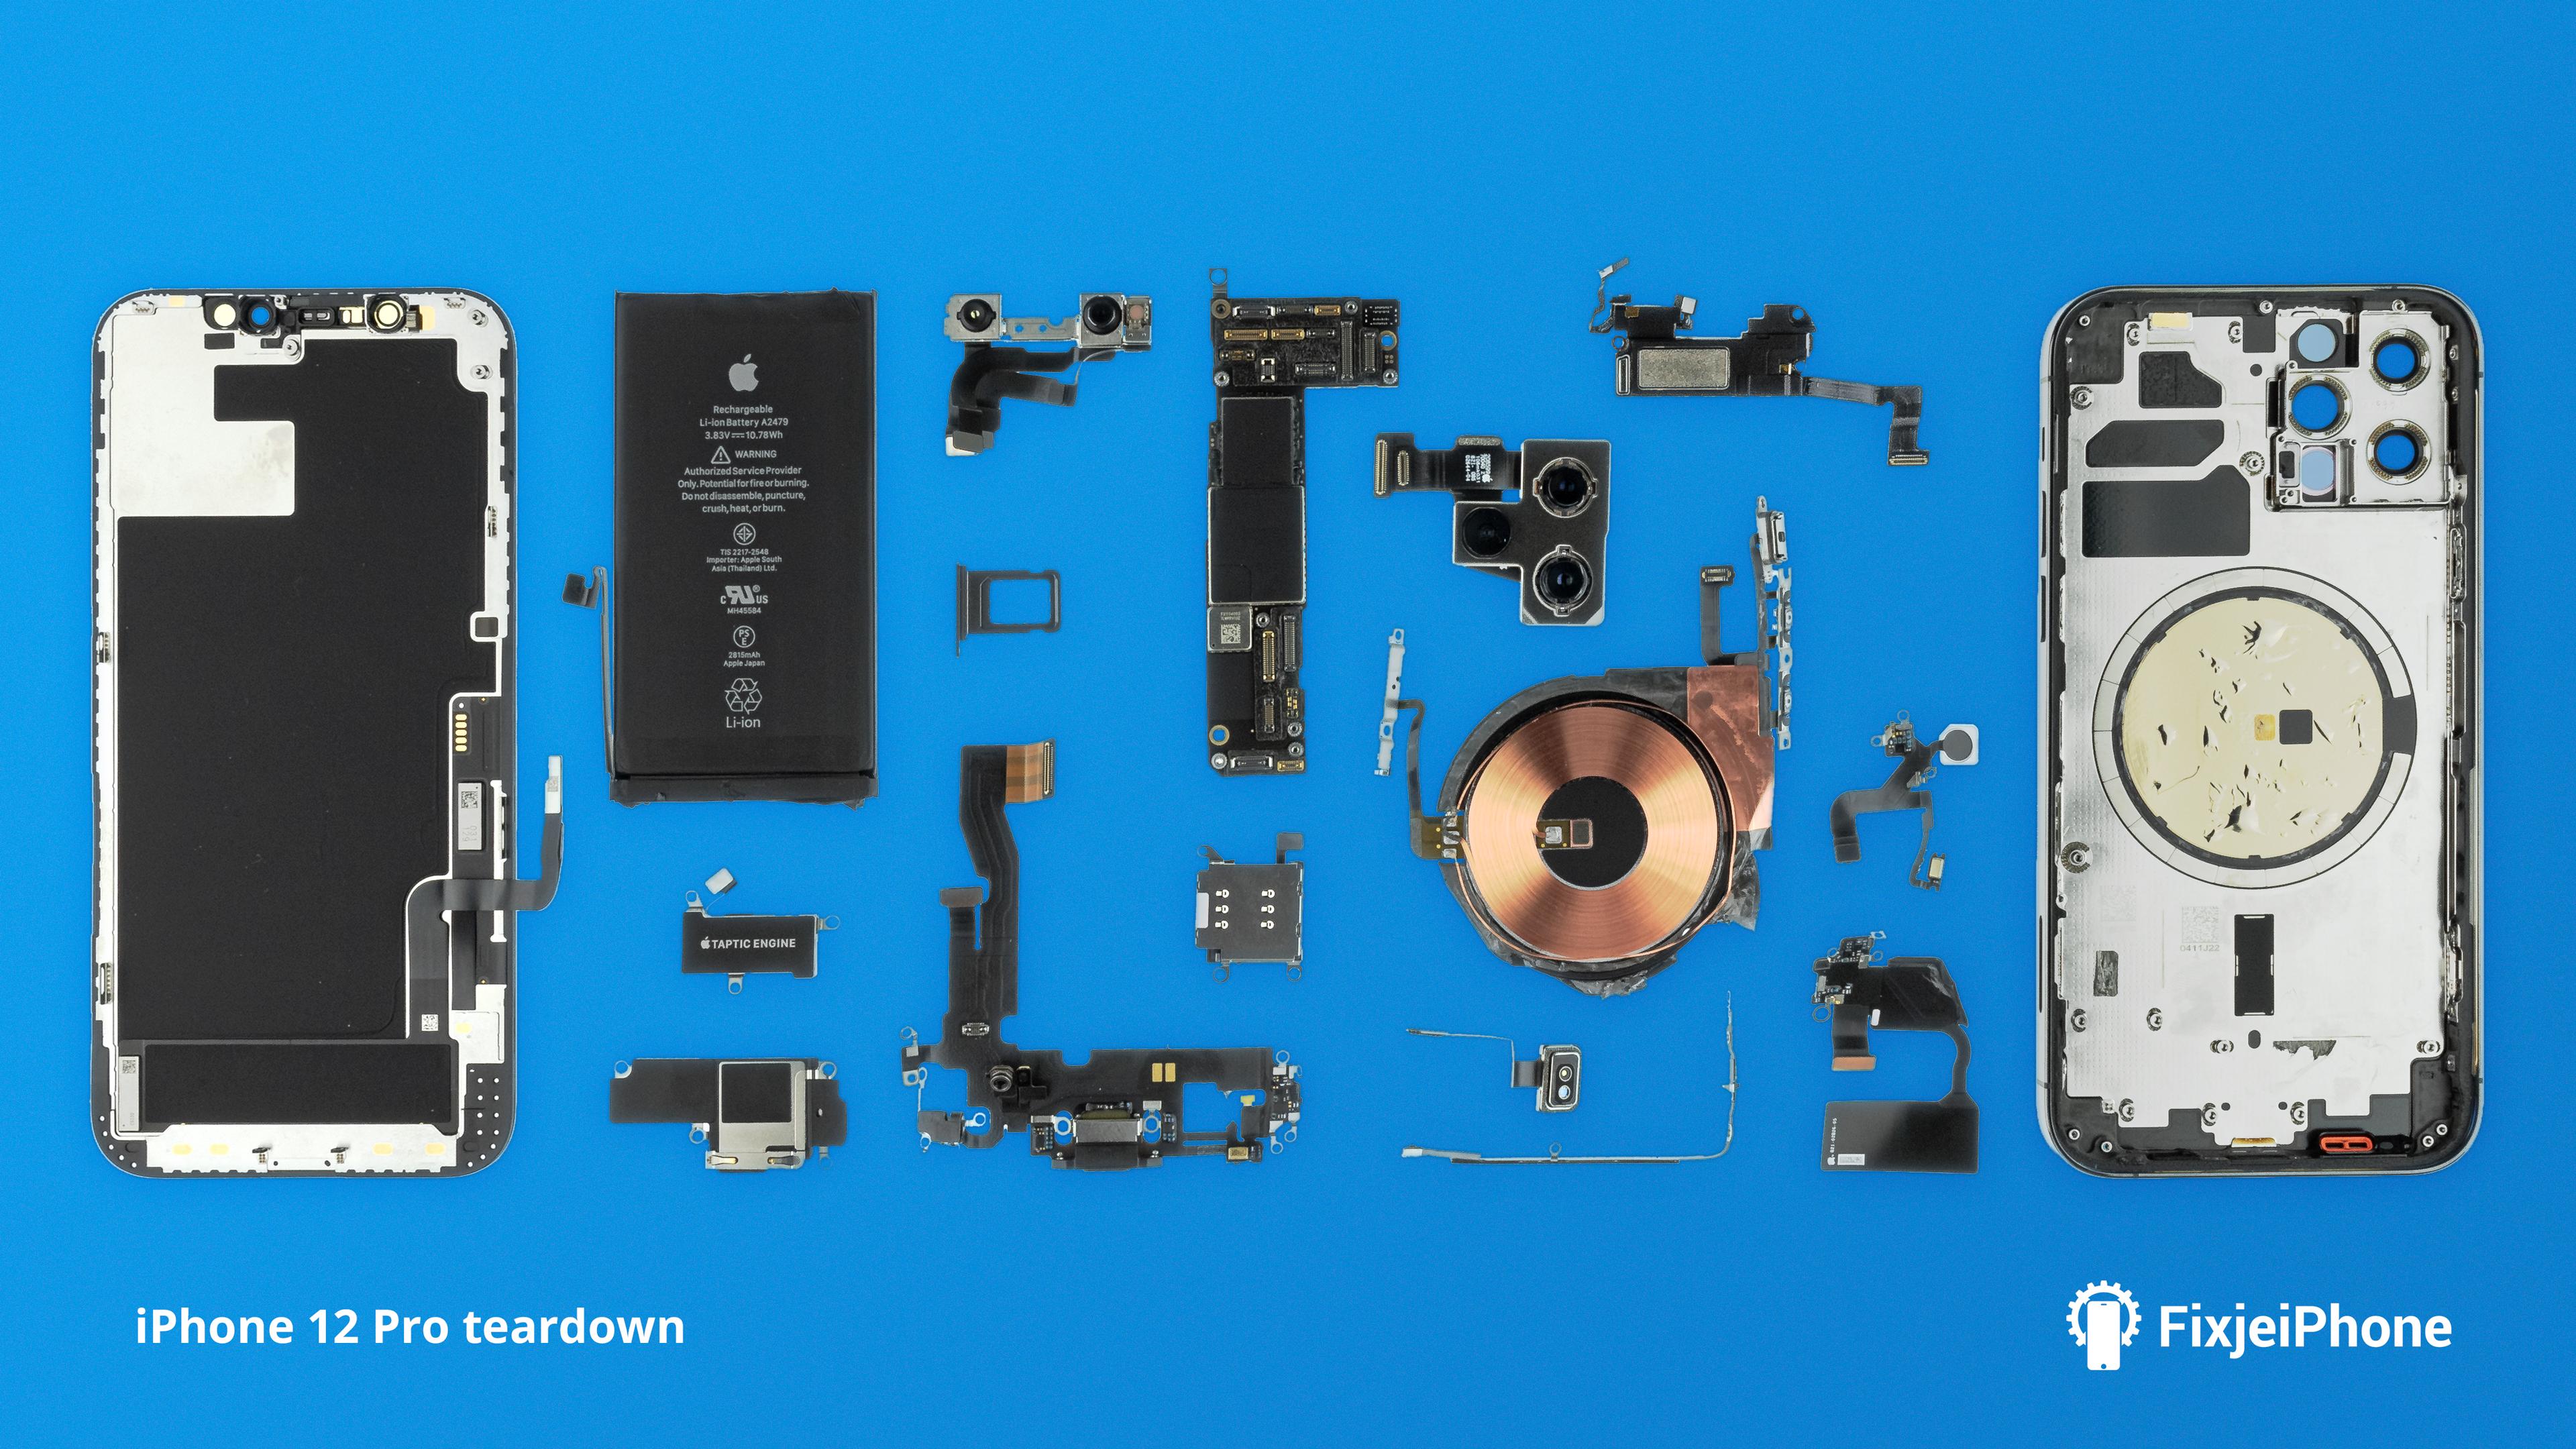 iPhone 12 Pro teardown